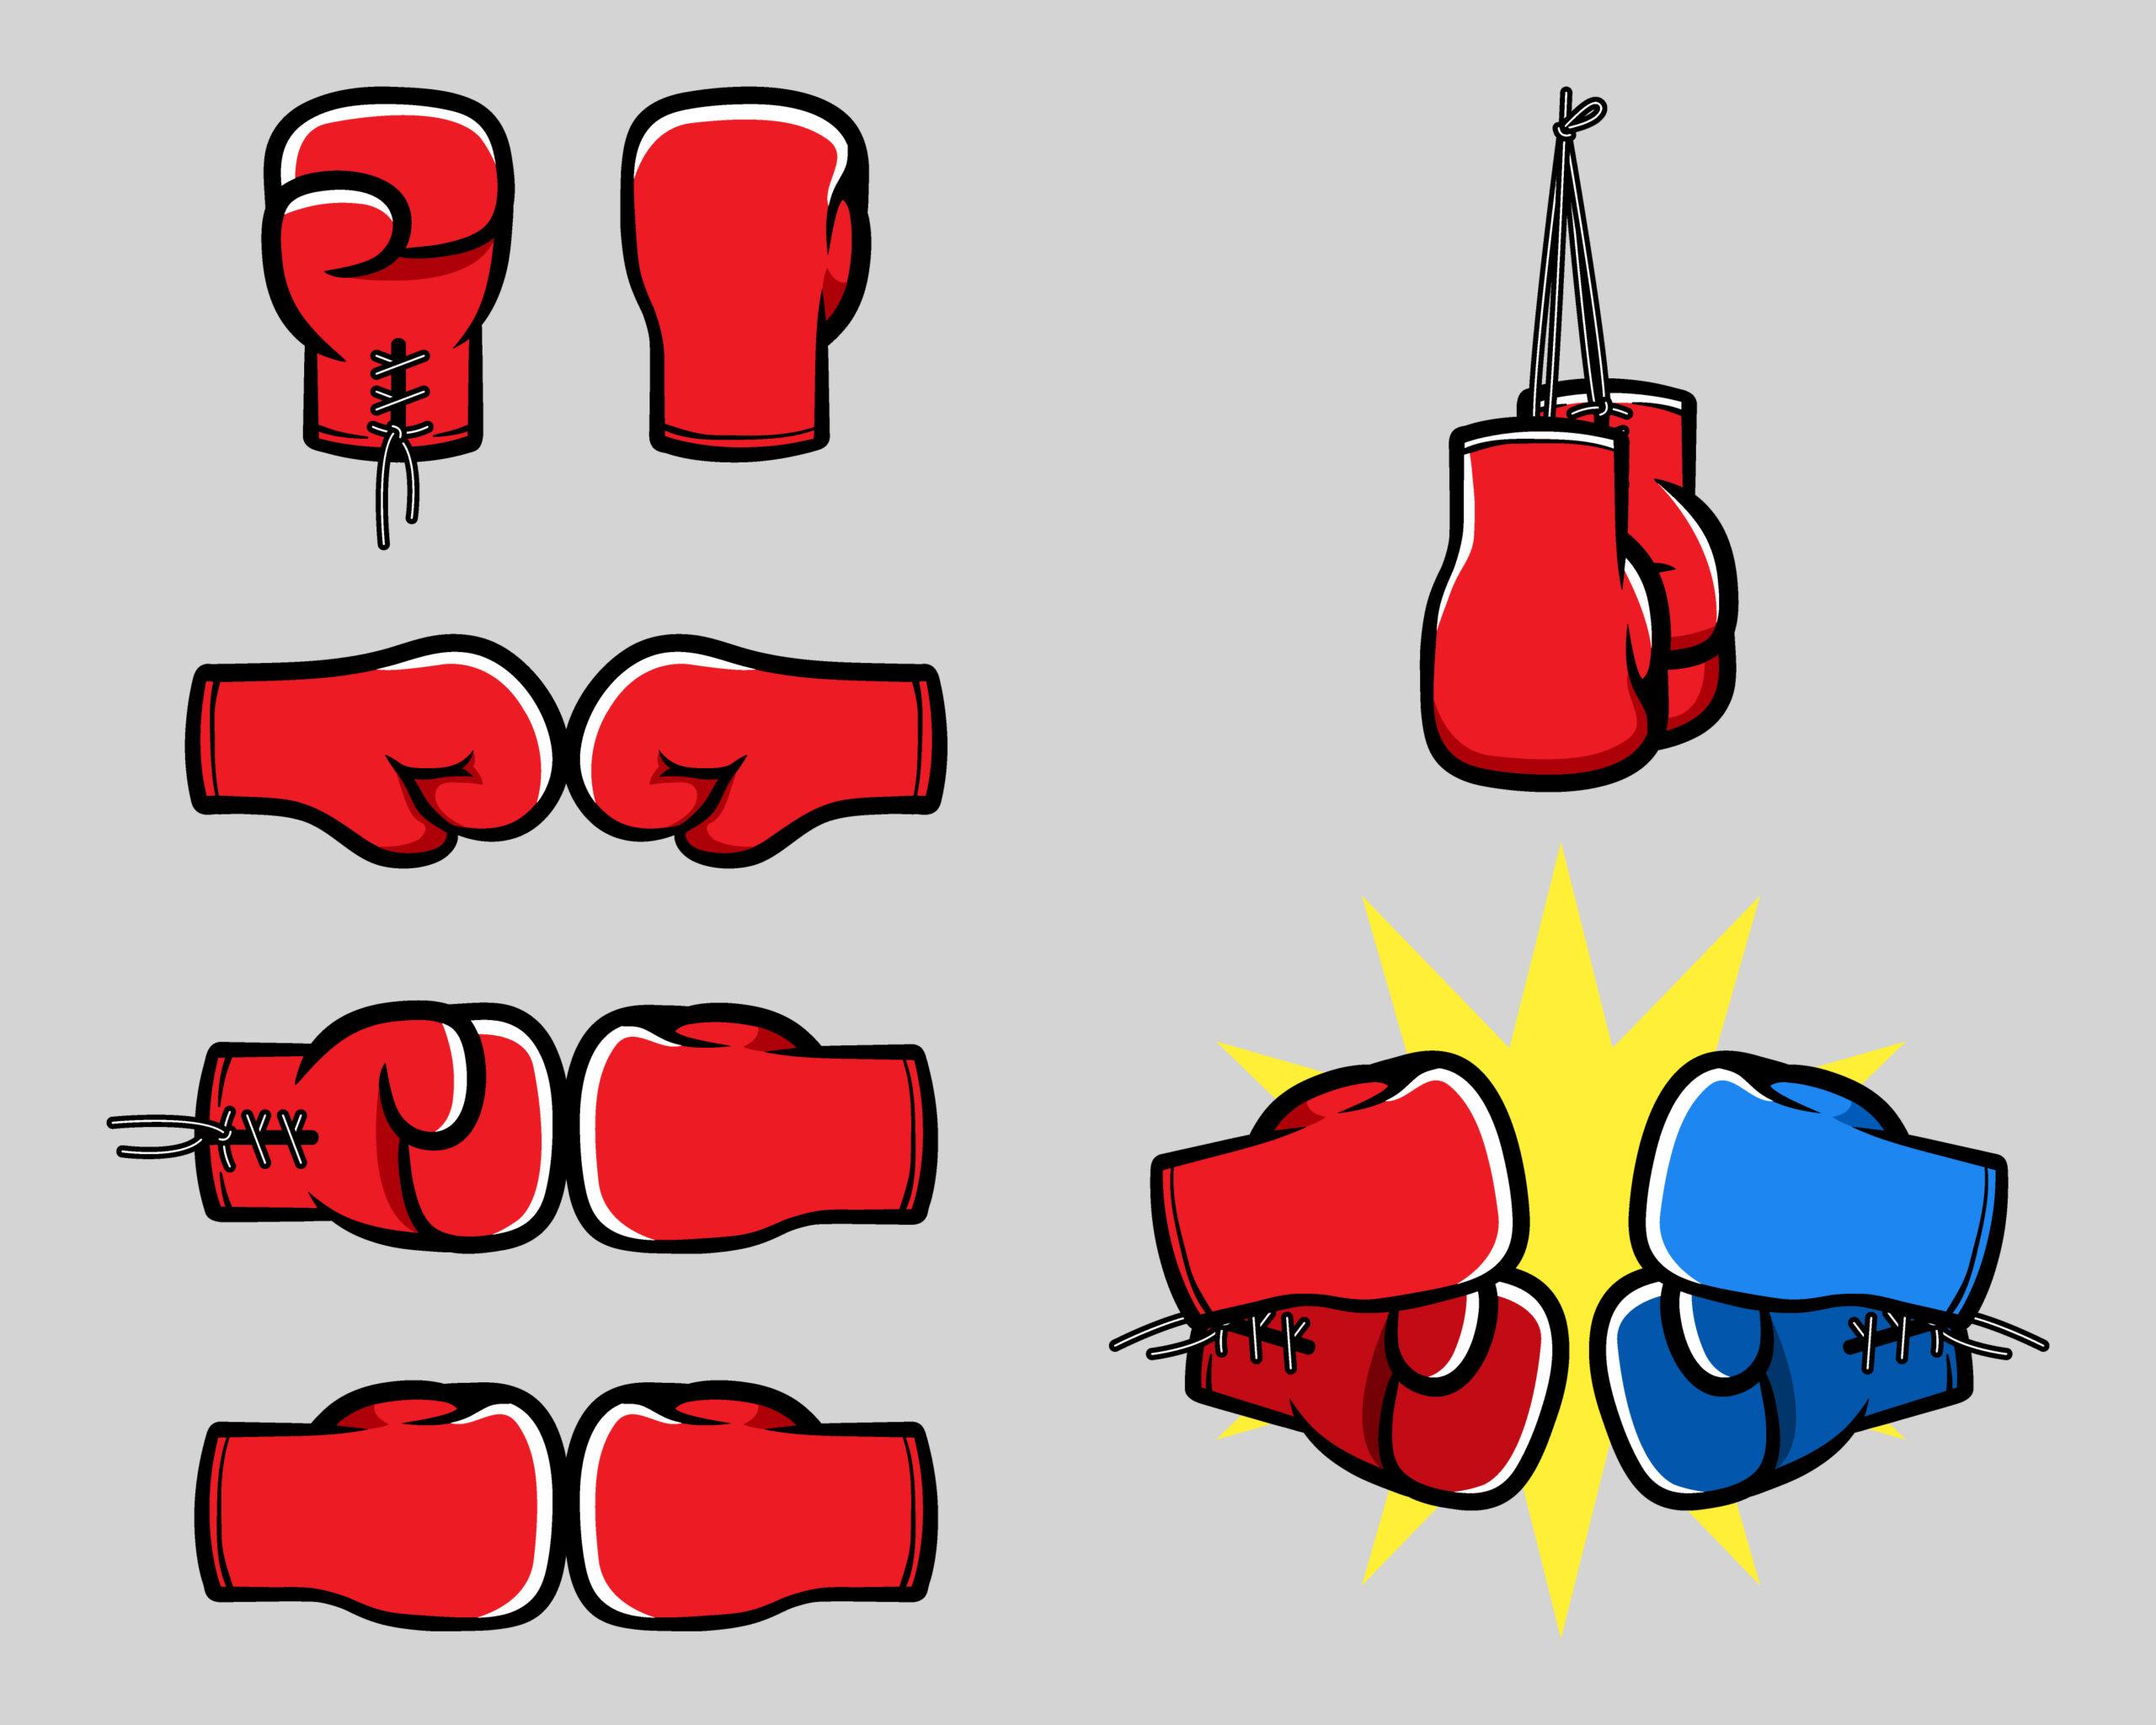 best-boxing-gloves-under-100-dollars